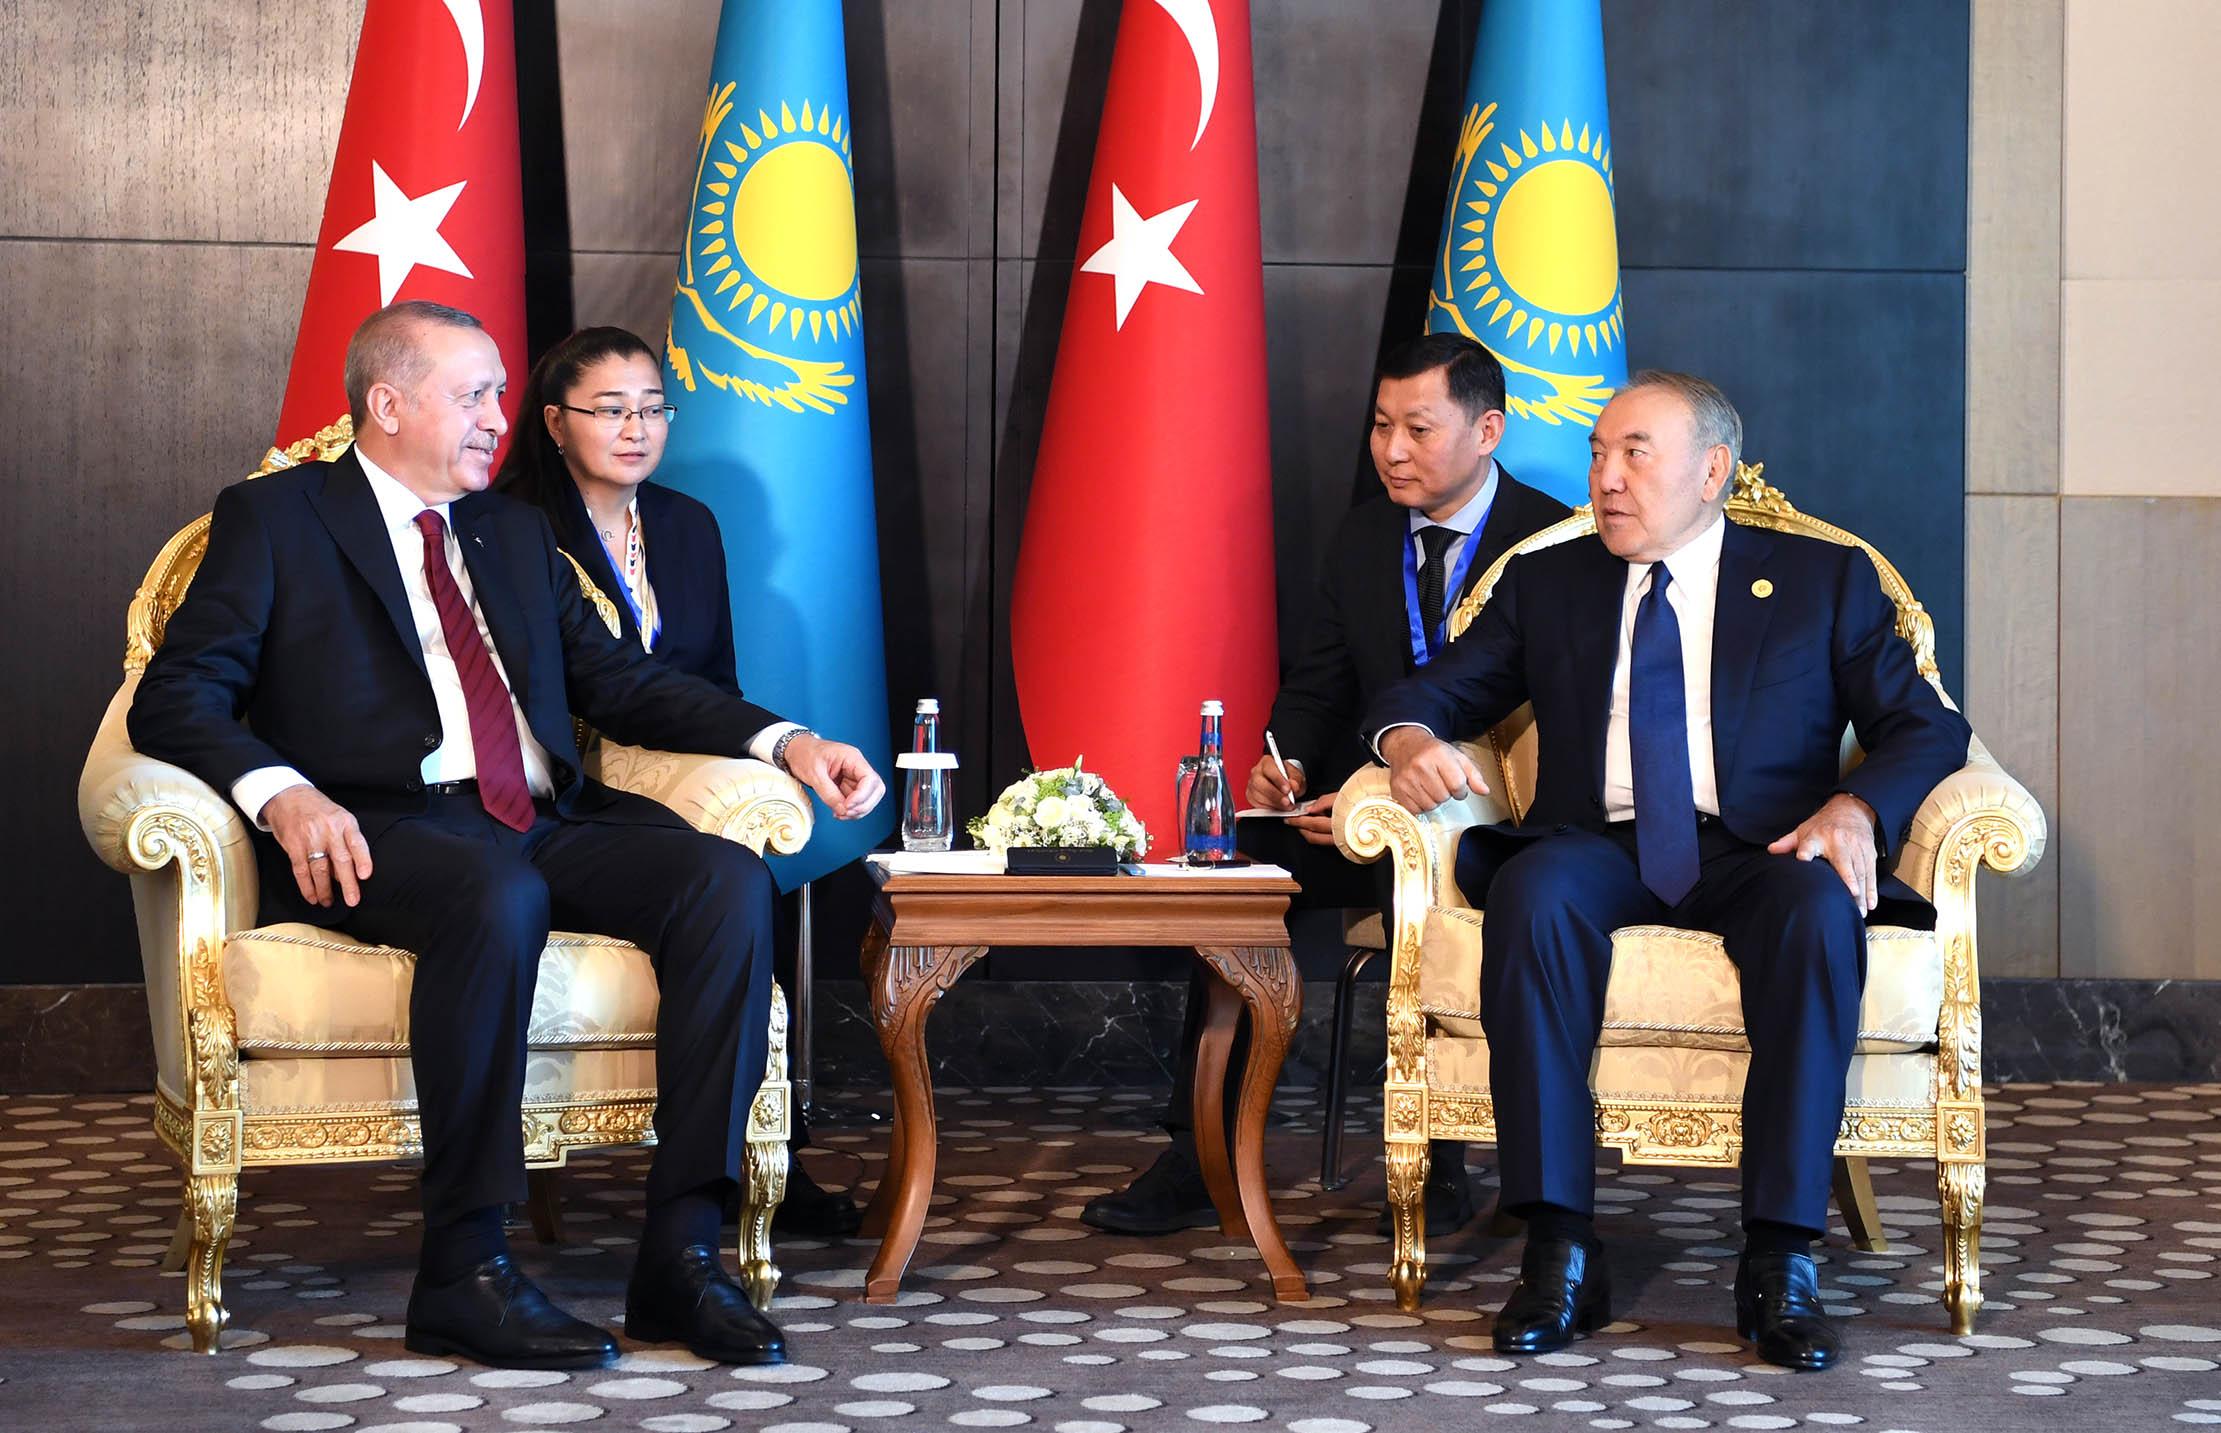 a7749d7f38a3eb59c0d88b30728c046c - The first President of Kazakhstan met with President of Turkey